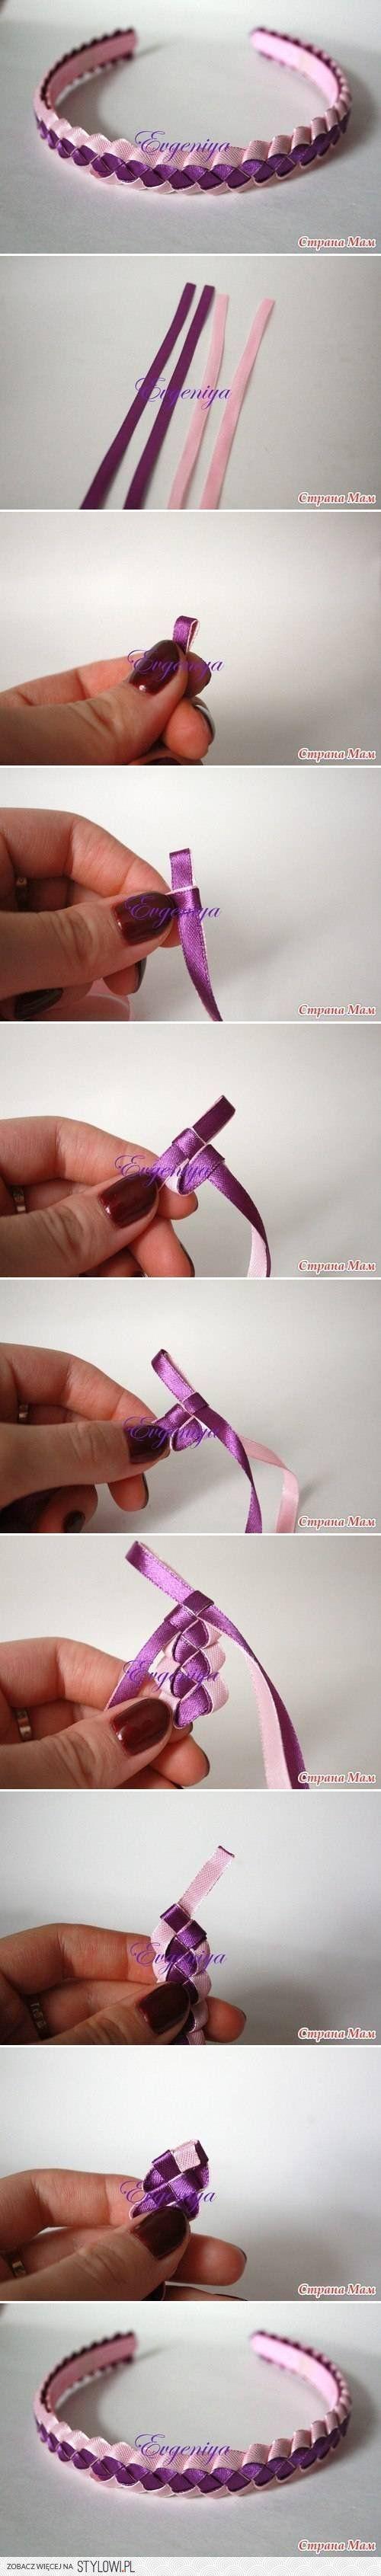 DIY 4 Strips Weaving DIY Projects | UsefulDIY.com na Stylowi.pl